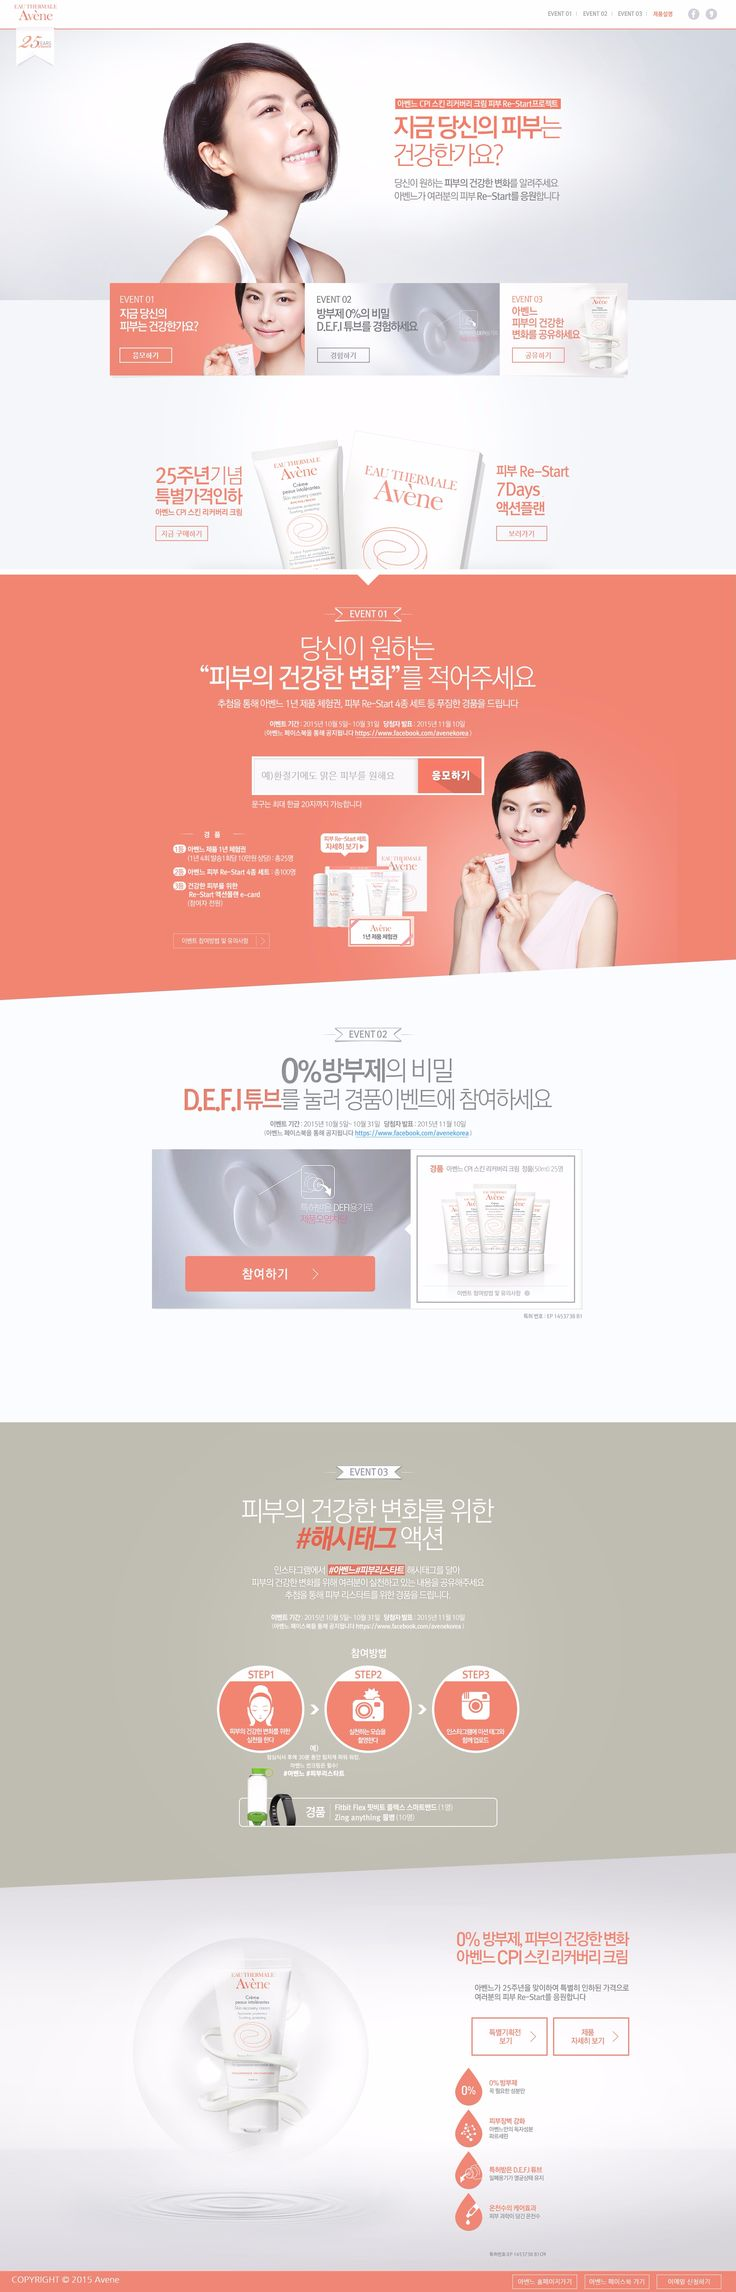 Korean web design. #peach #gray                                                                                                                                                                                 More